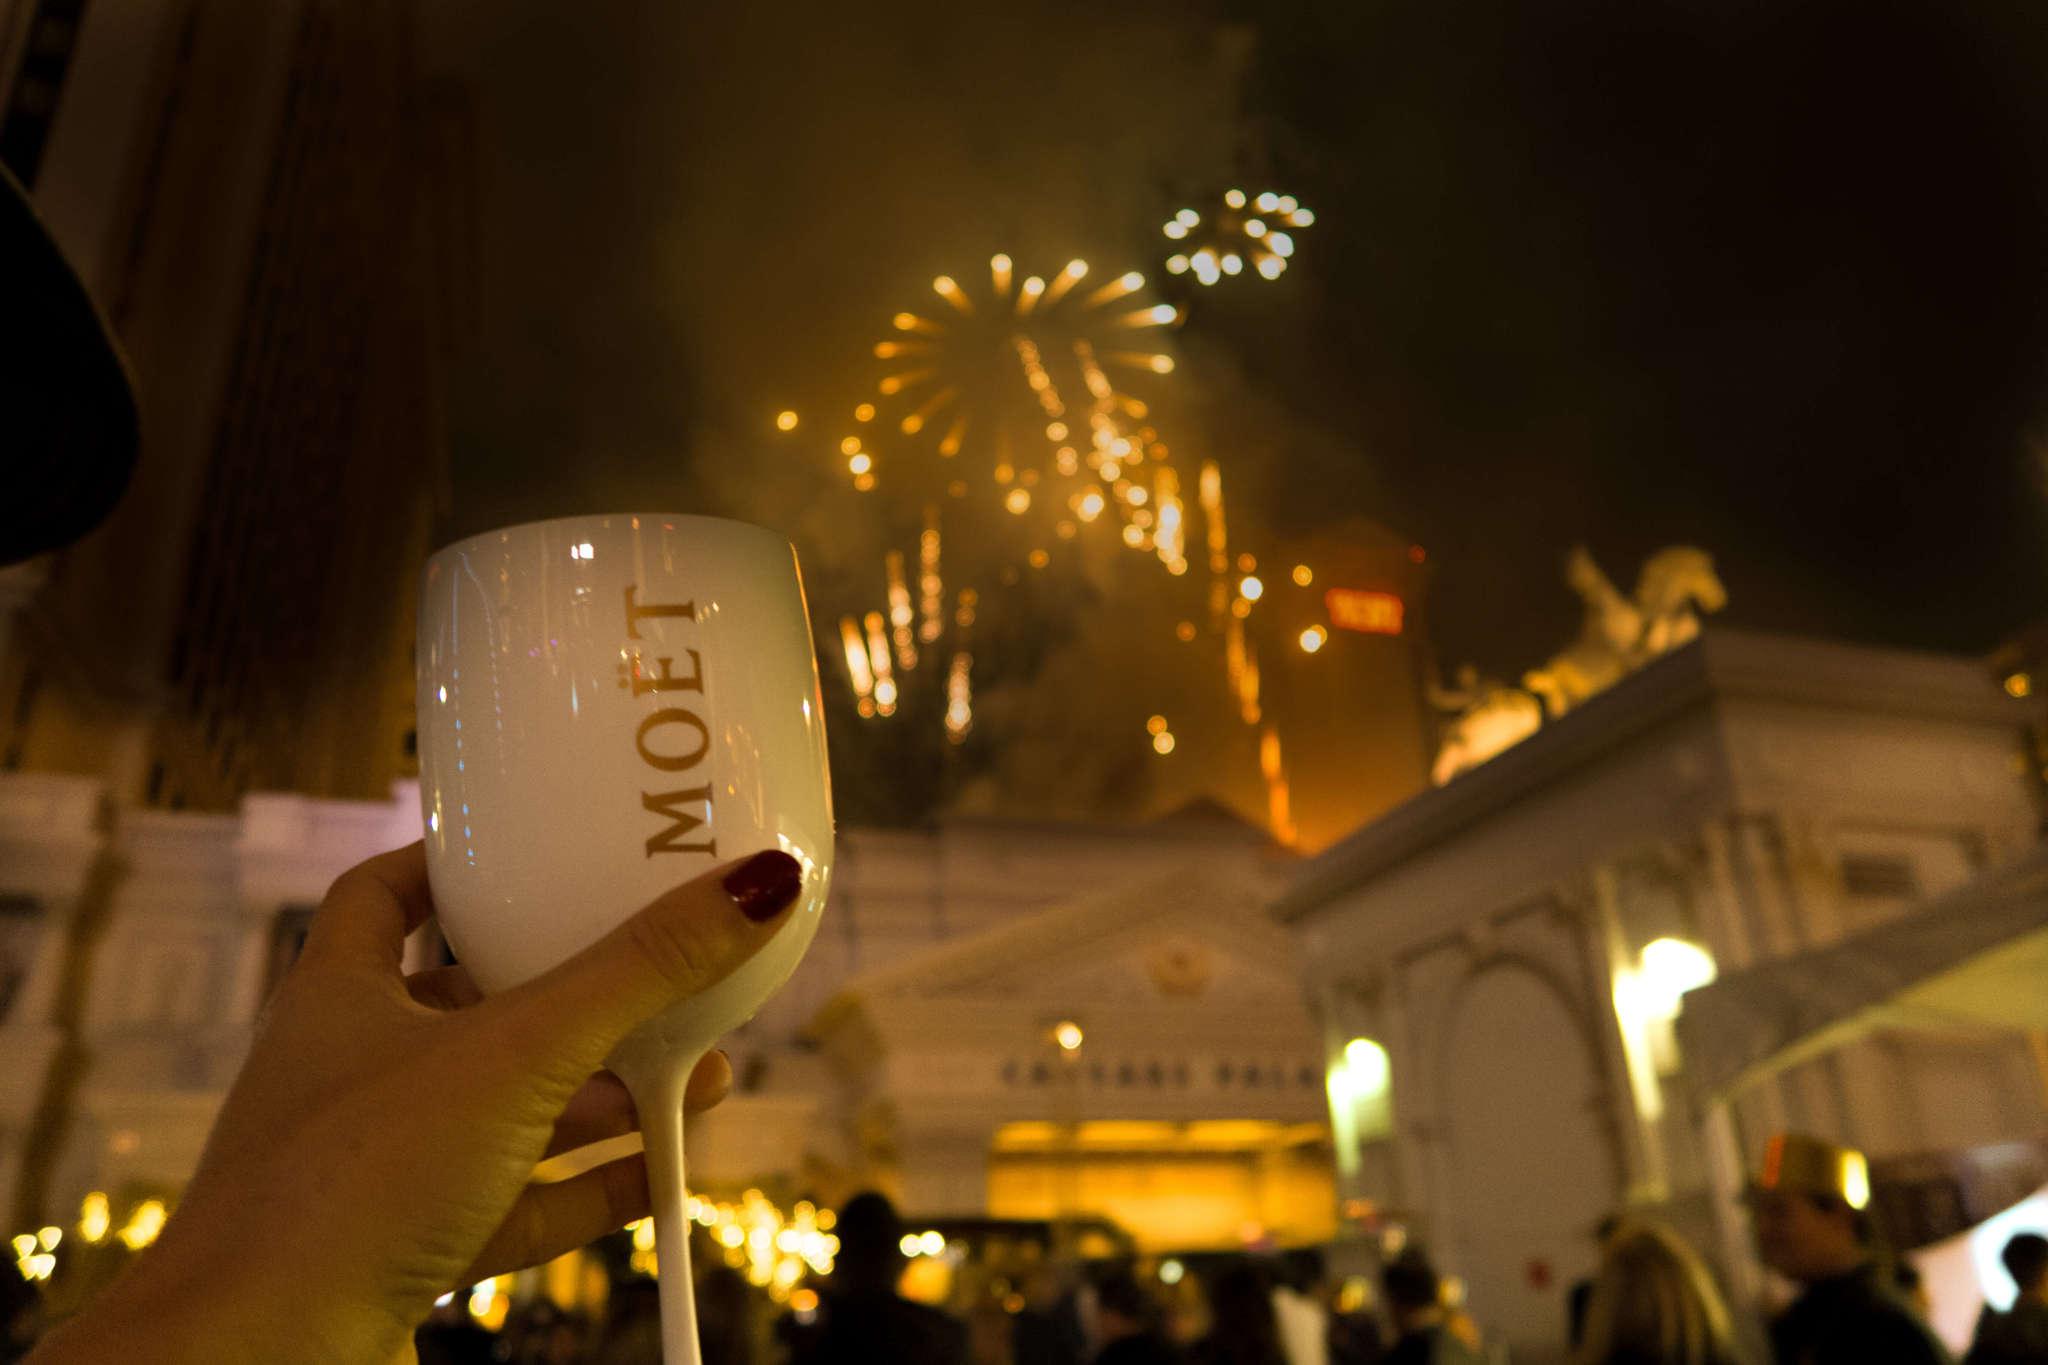 fireworks on NYE in vegas